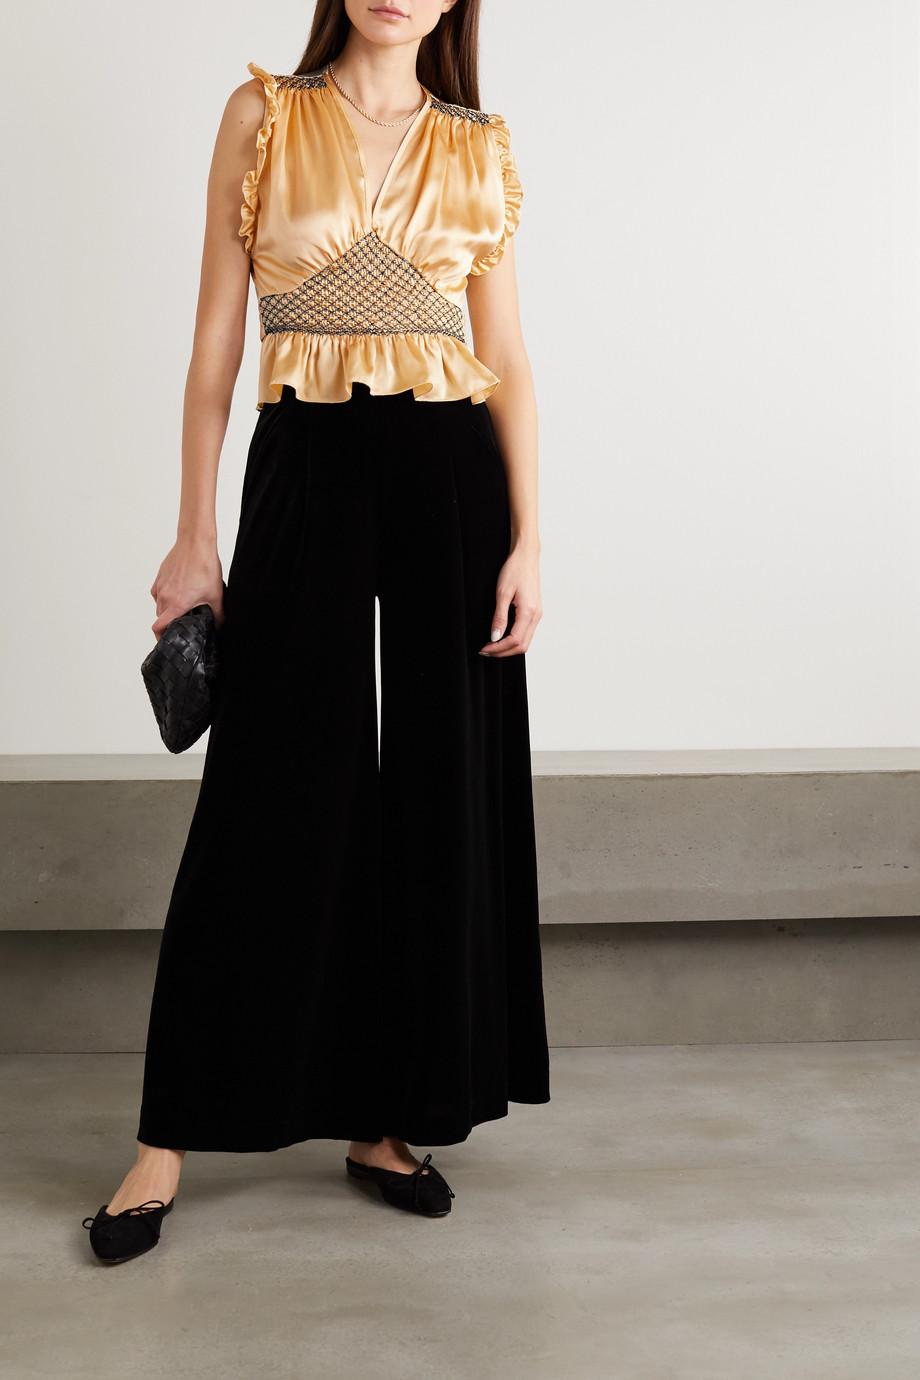 Loretta Caponi Valeria cropped bow-detailed ruffled smocked silk-satin top